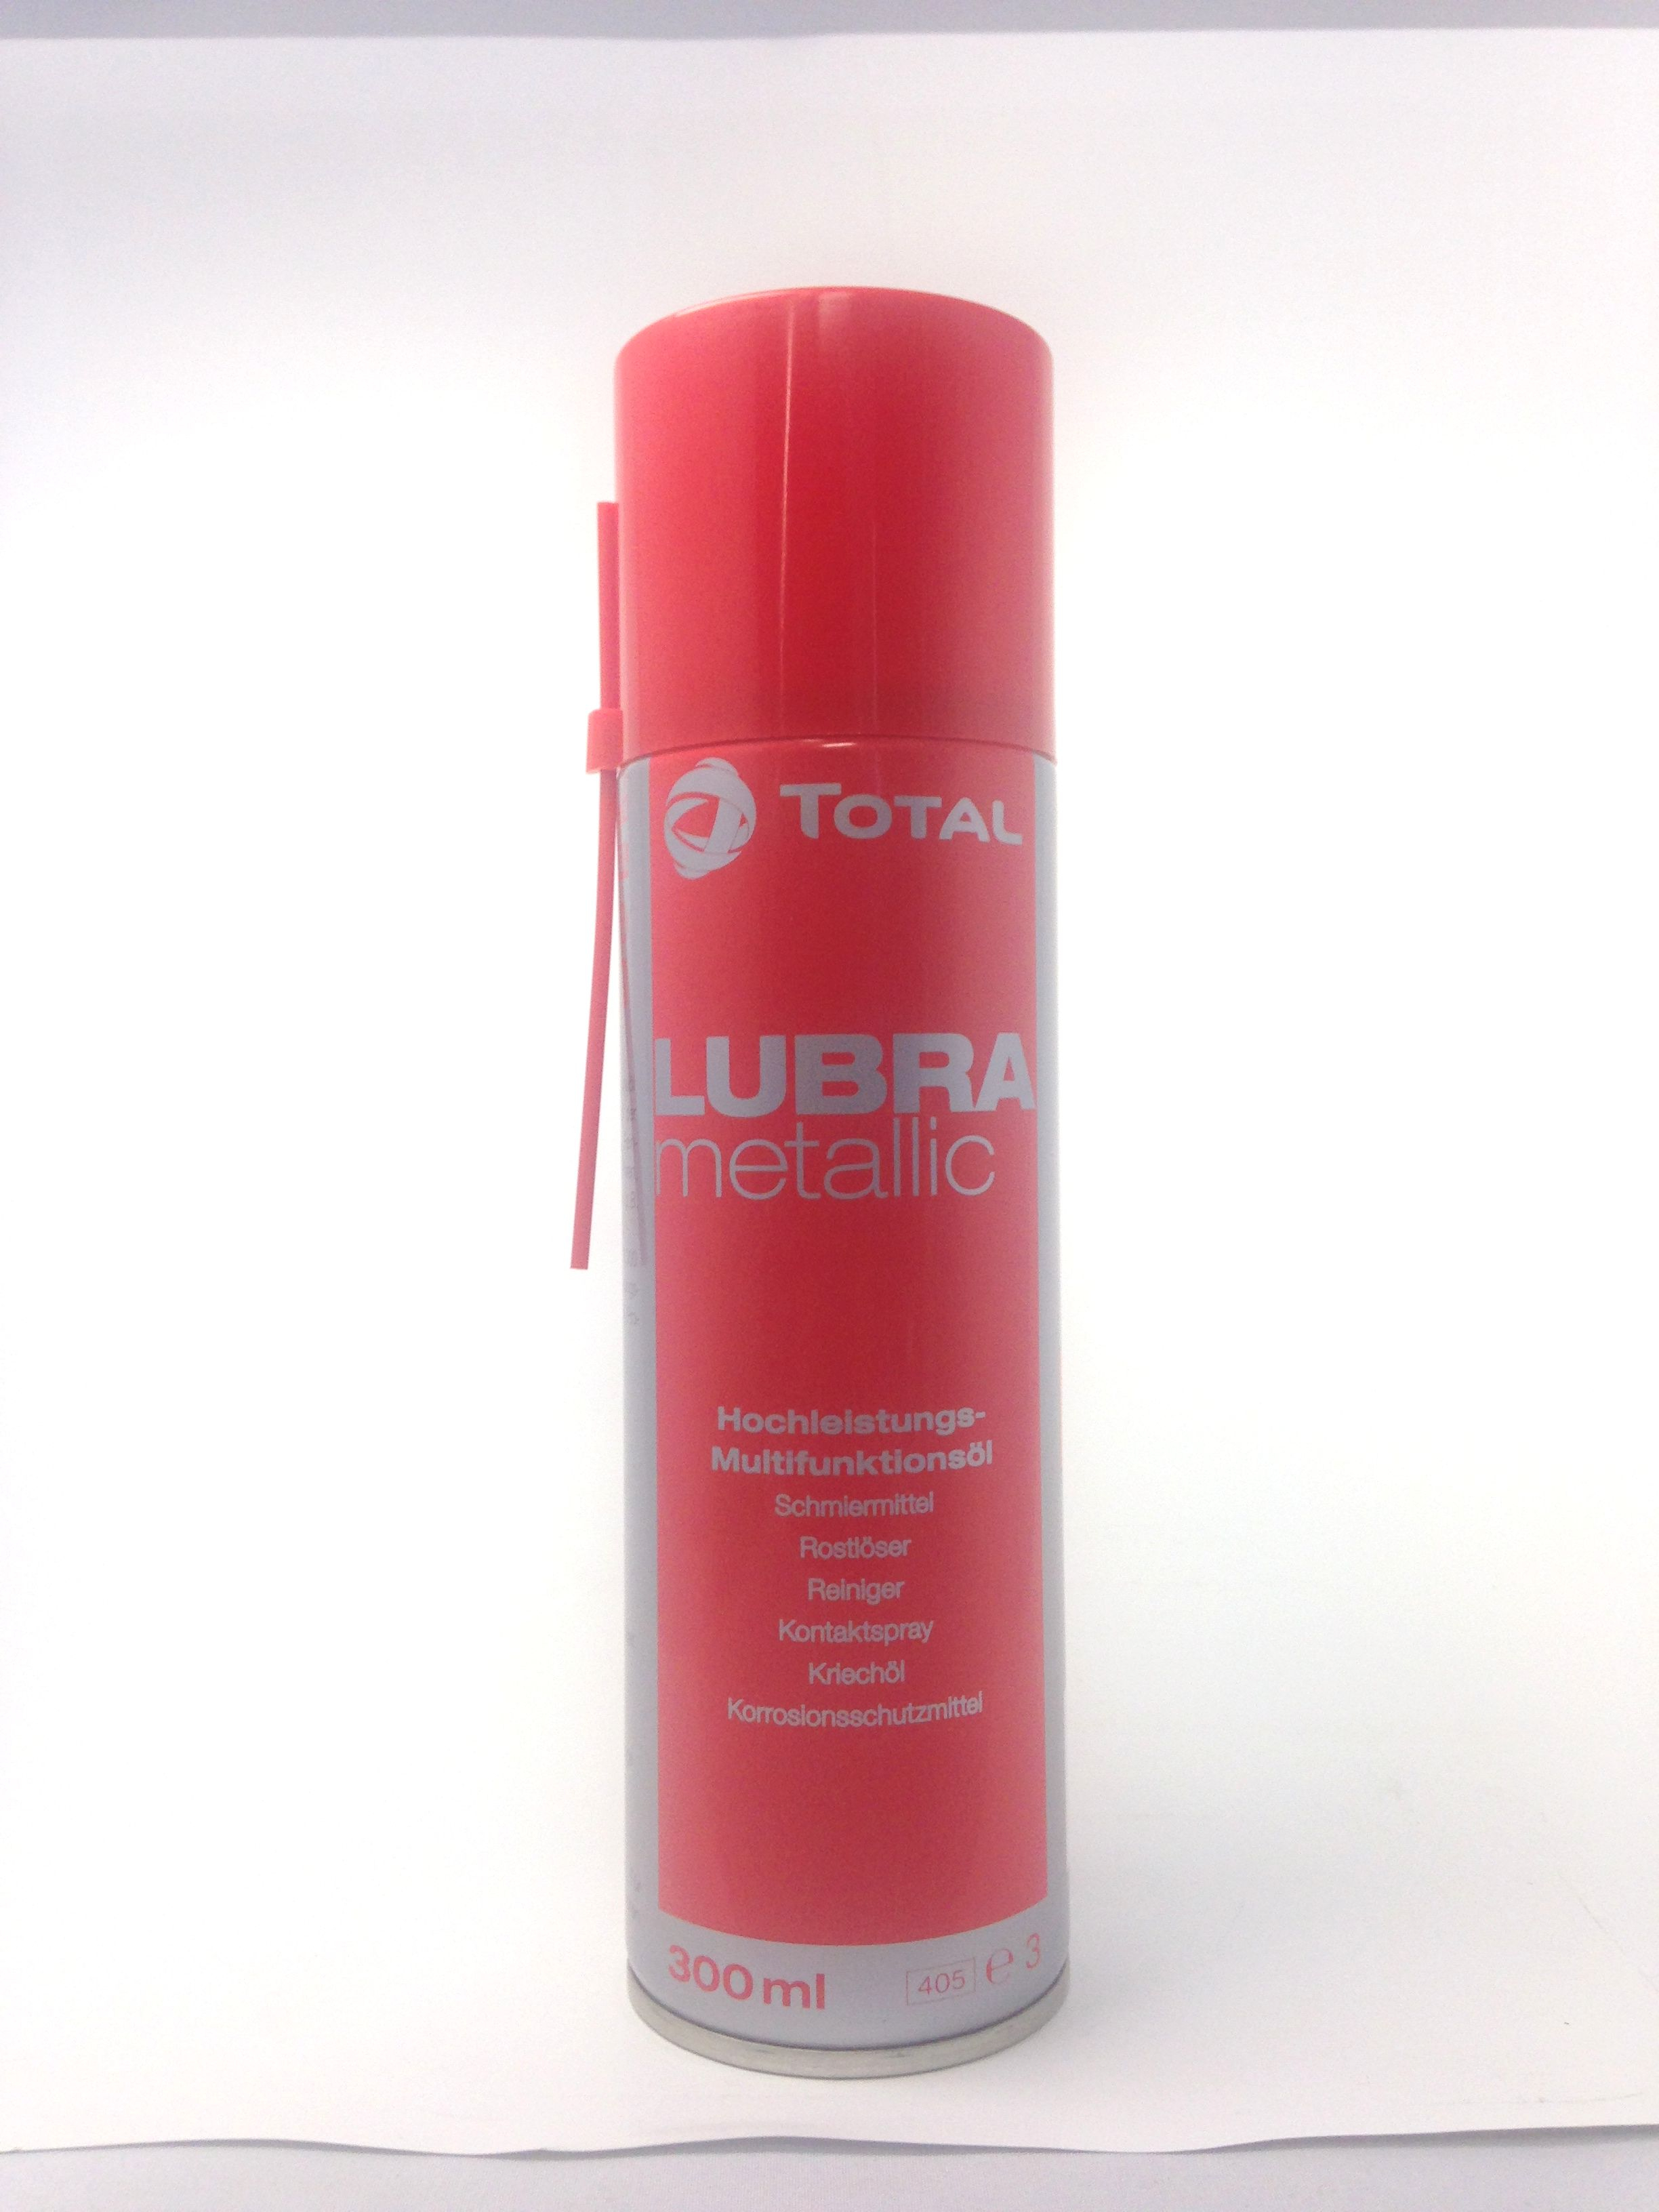 300 ml TOTAL LUBRA metallic - Spray Multifunktionsöl